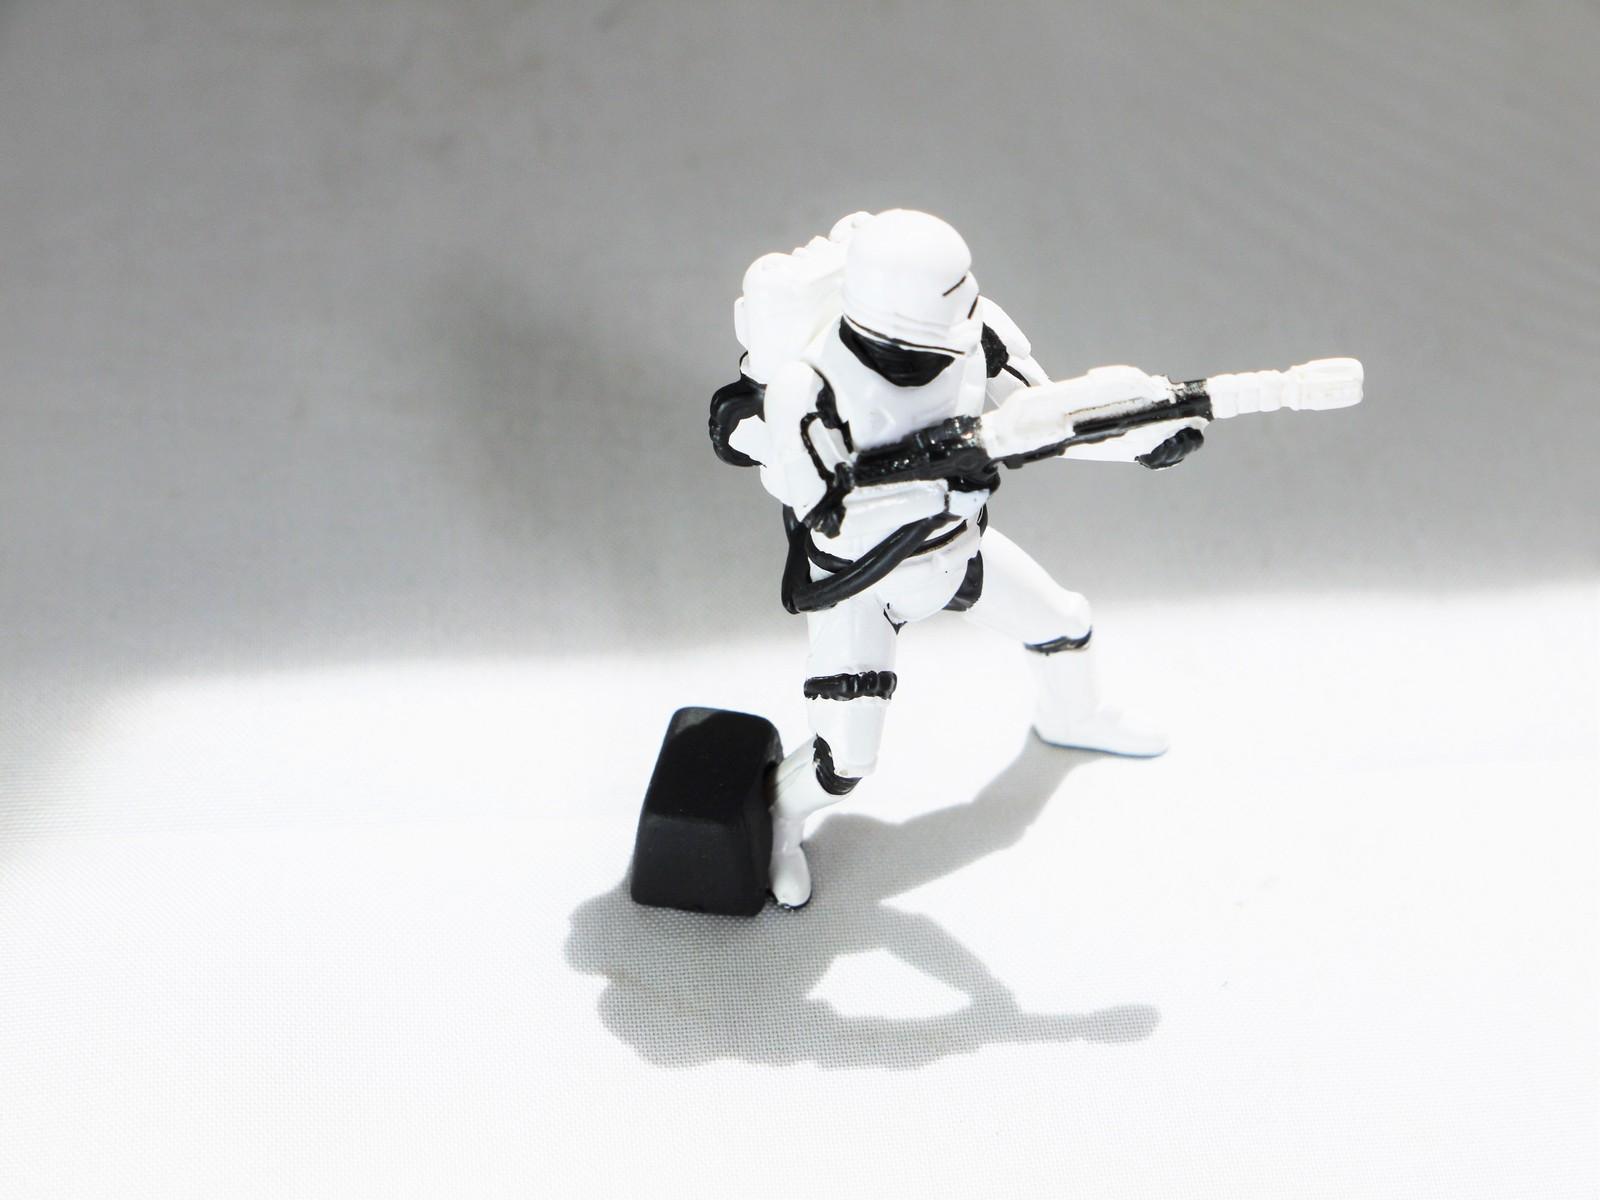 ARTS STAR WARS Characters GACHA GALAXY DESKTOP FIRST ORDER Phase 2 Flametrooper